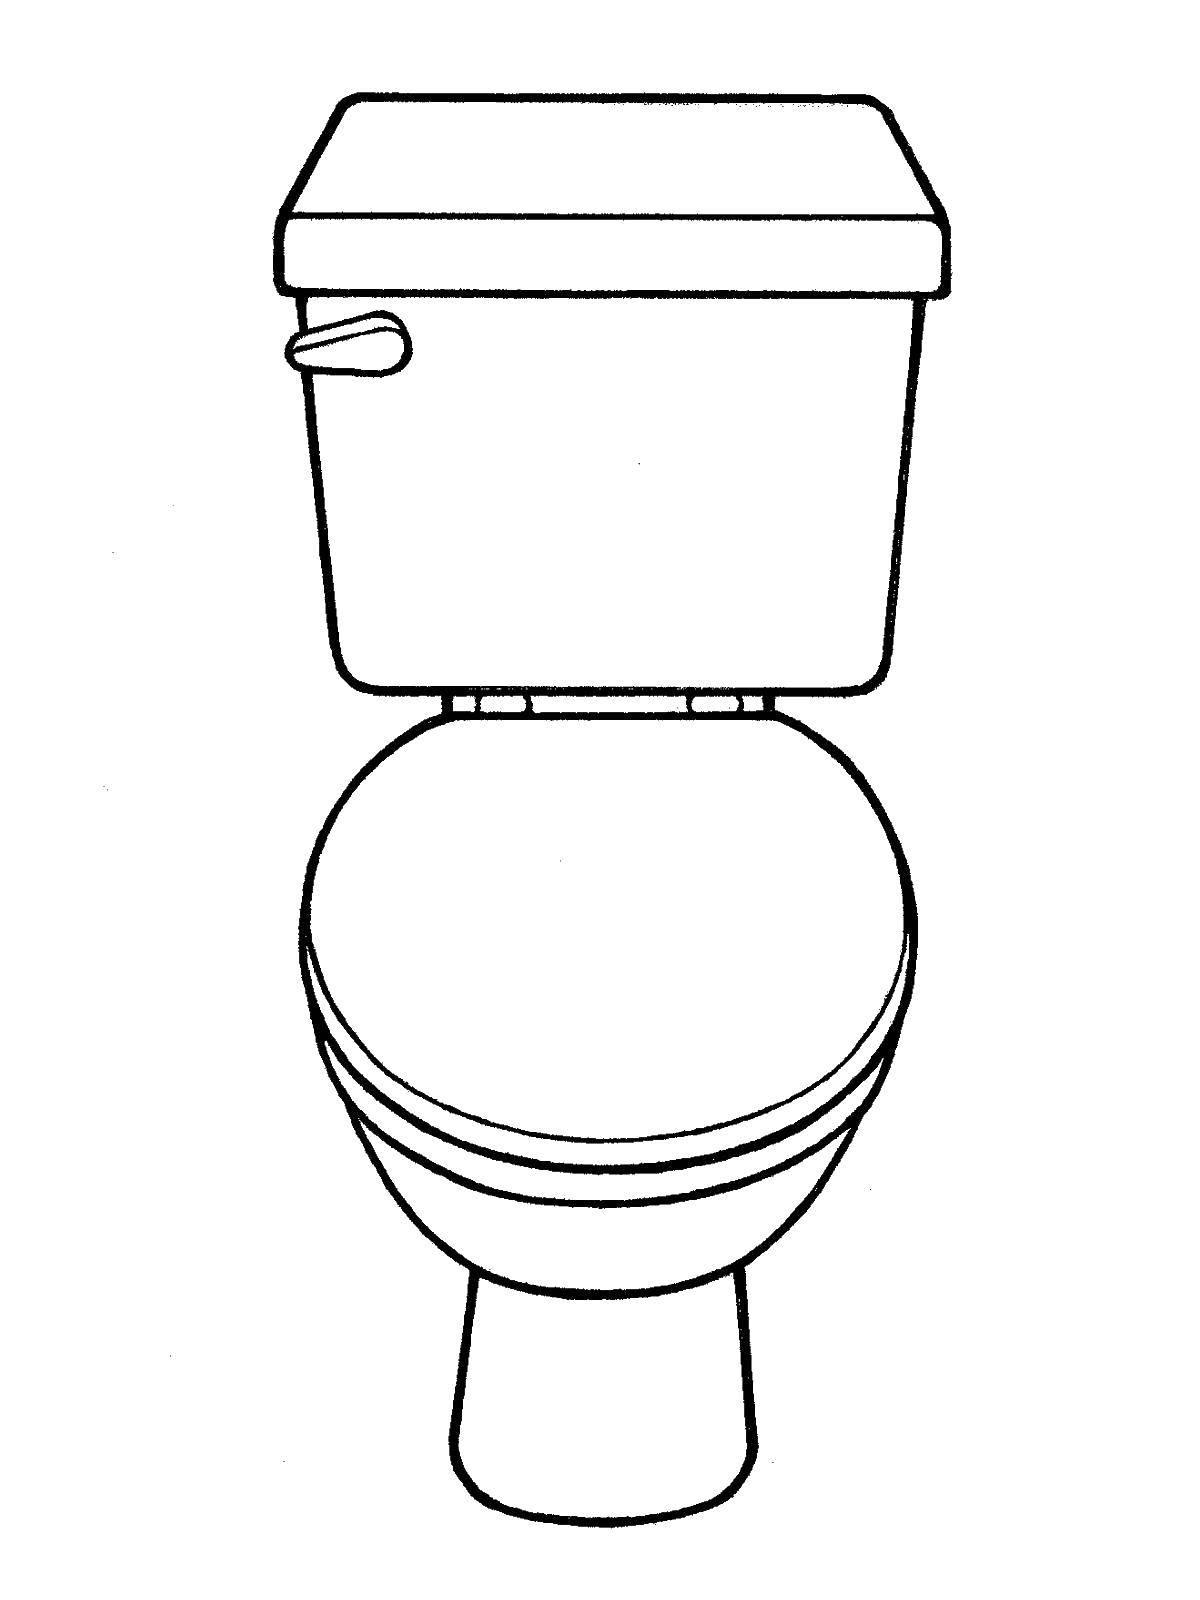 Раскраска Ванная комната Скачать ,Туалет,.  Распечатать